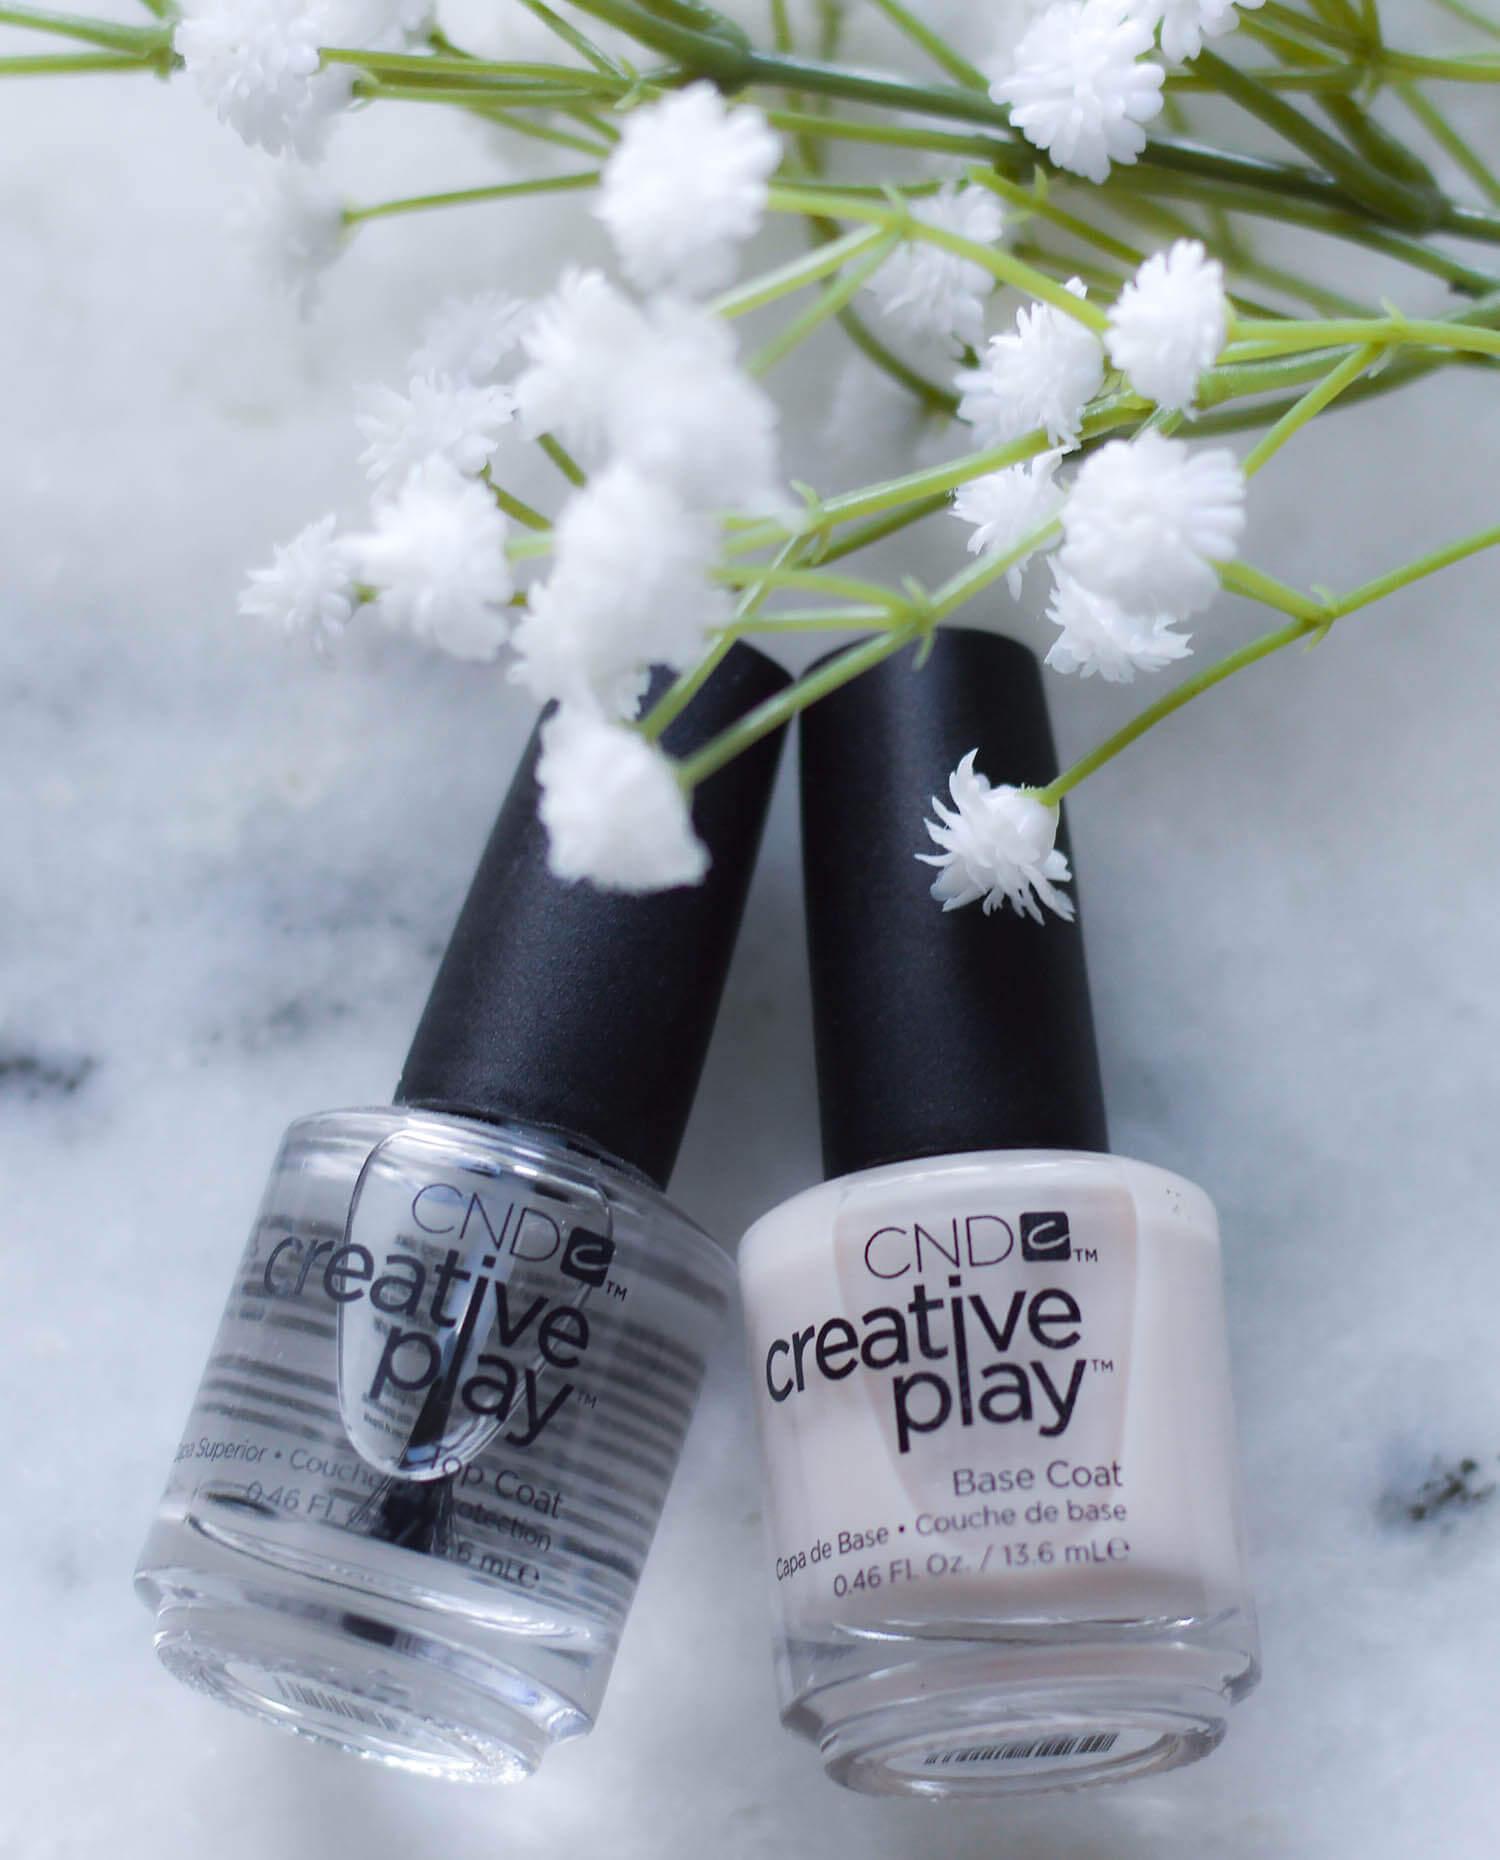 Beauty-Skin-Care-Sculpting-Gel-and-Nail-Polish-Basics-kationette-lifestyleblogger-bloggerclub